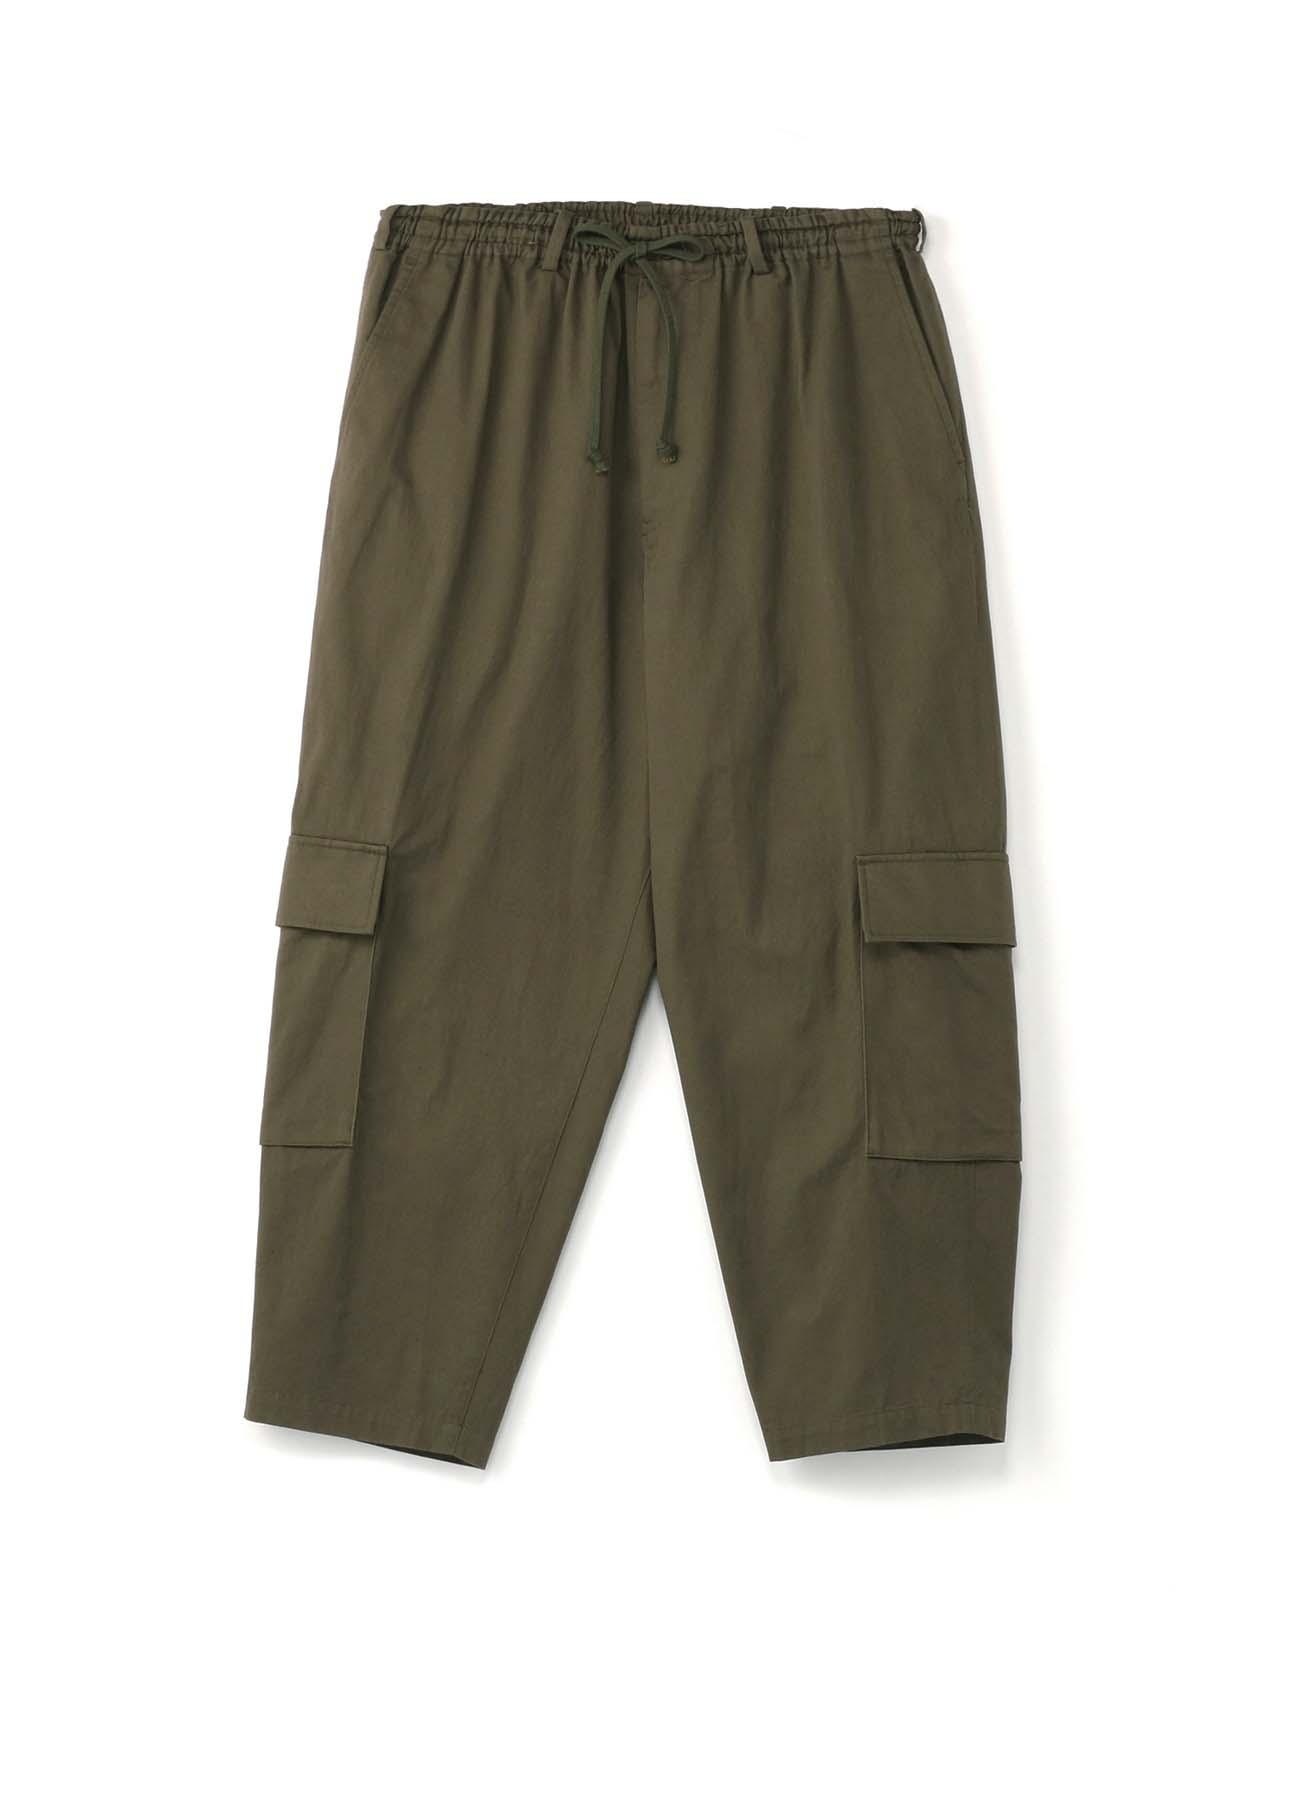 20/Cotton Twill Cargo Pants